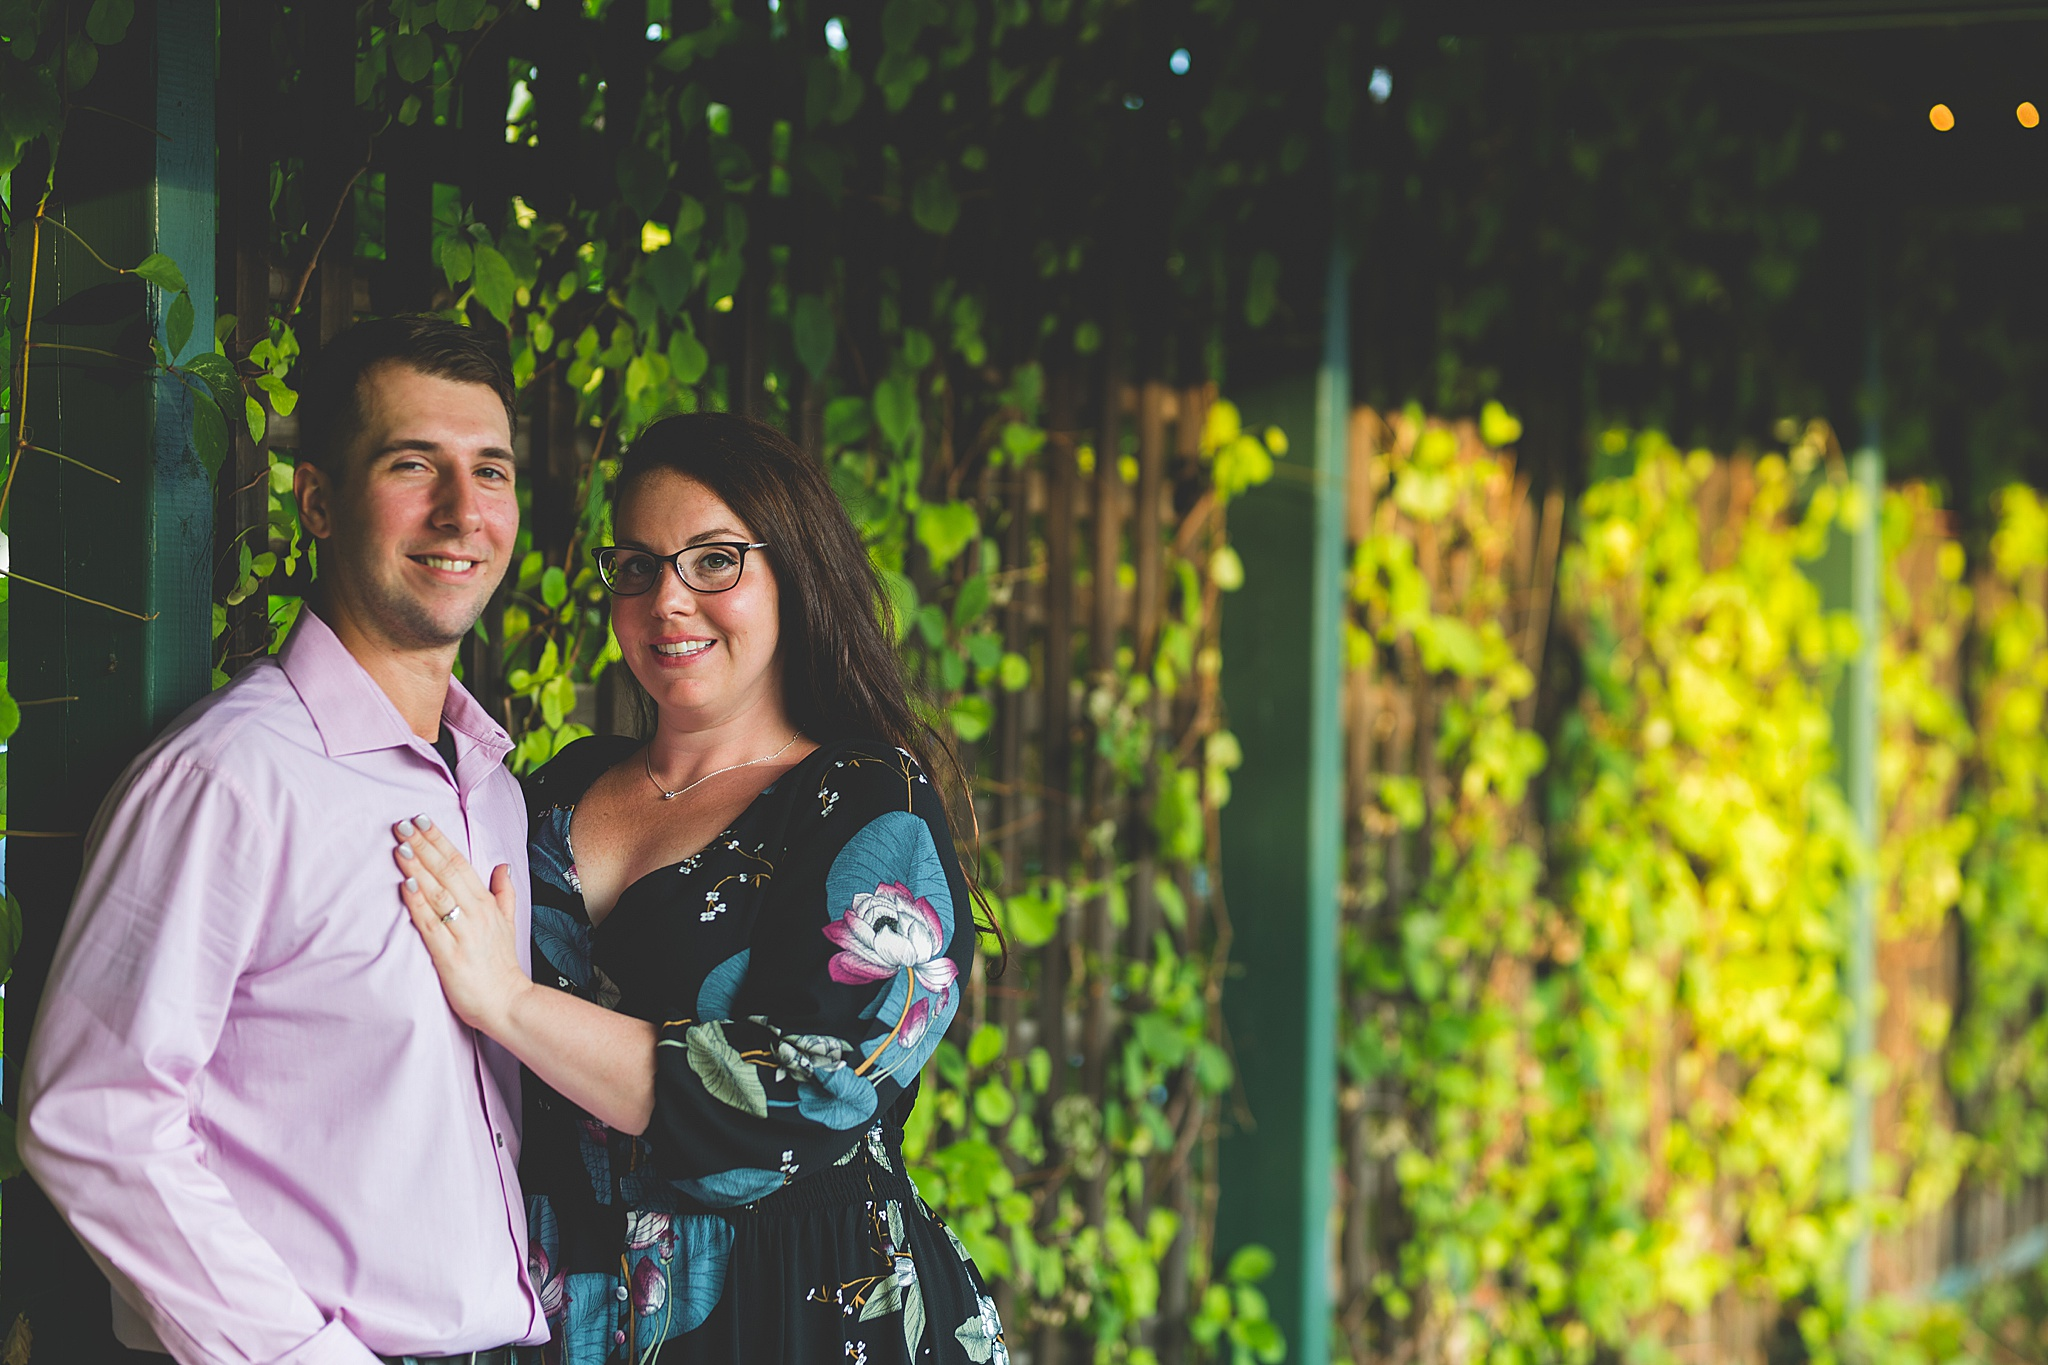 Albany_Wedding_Photographer_7704.jpg